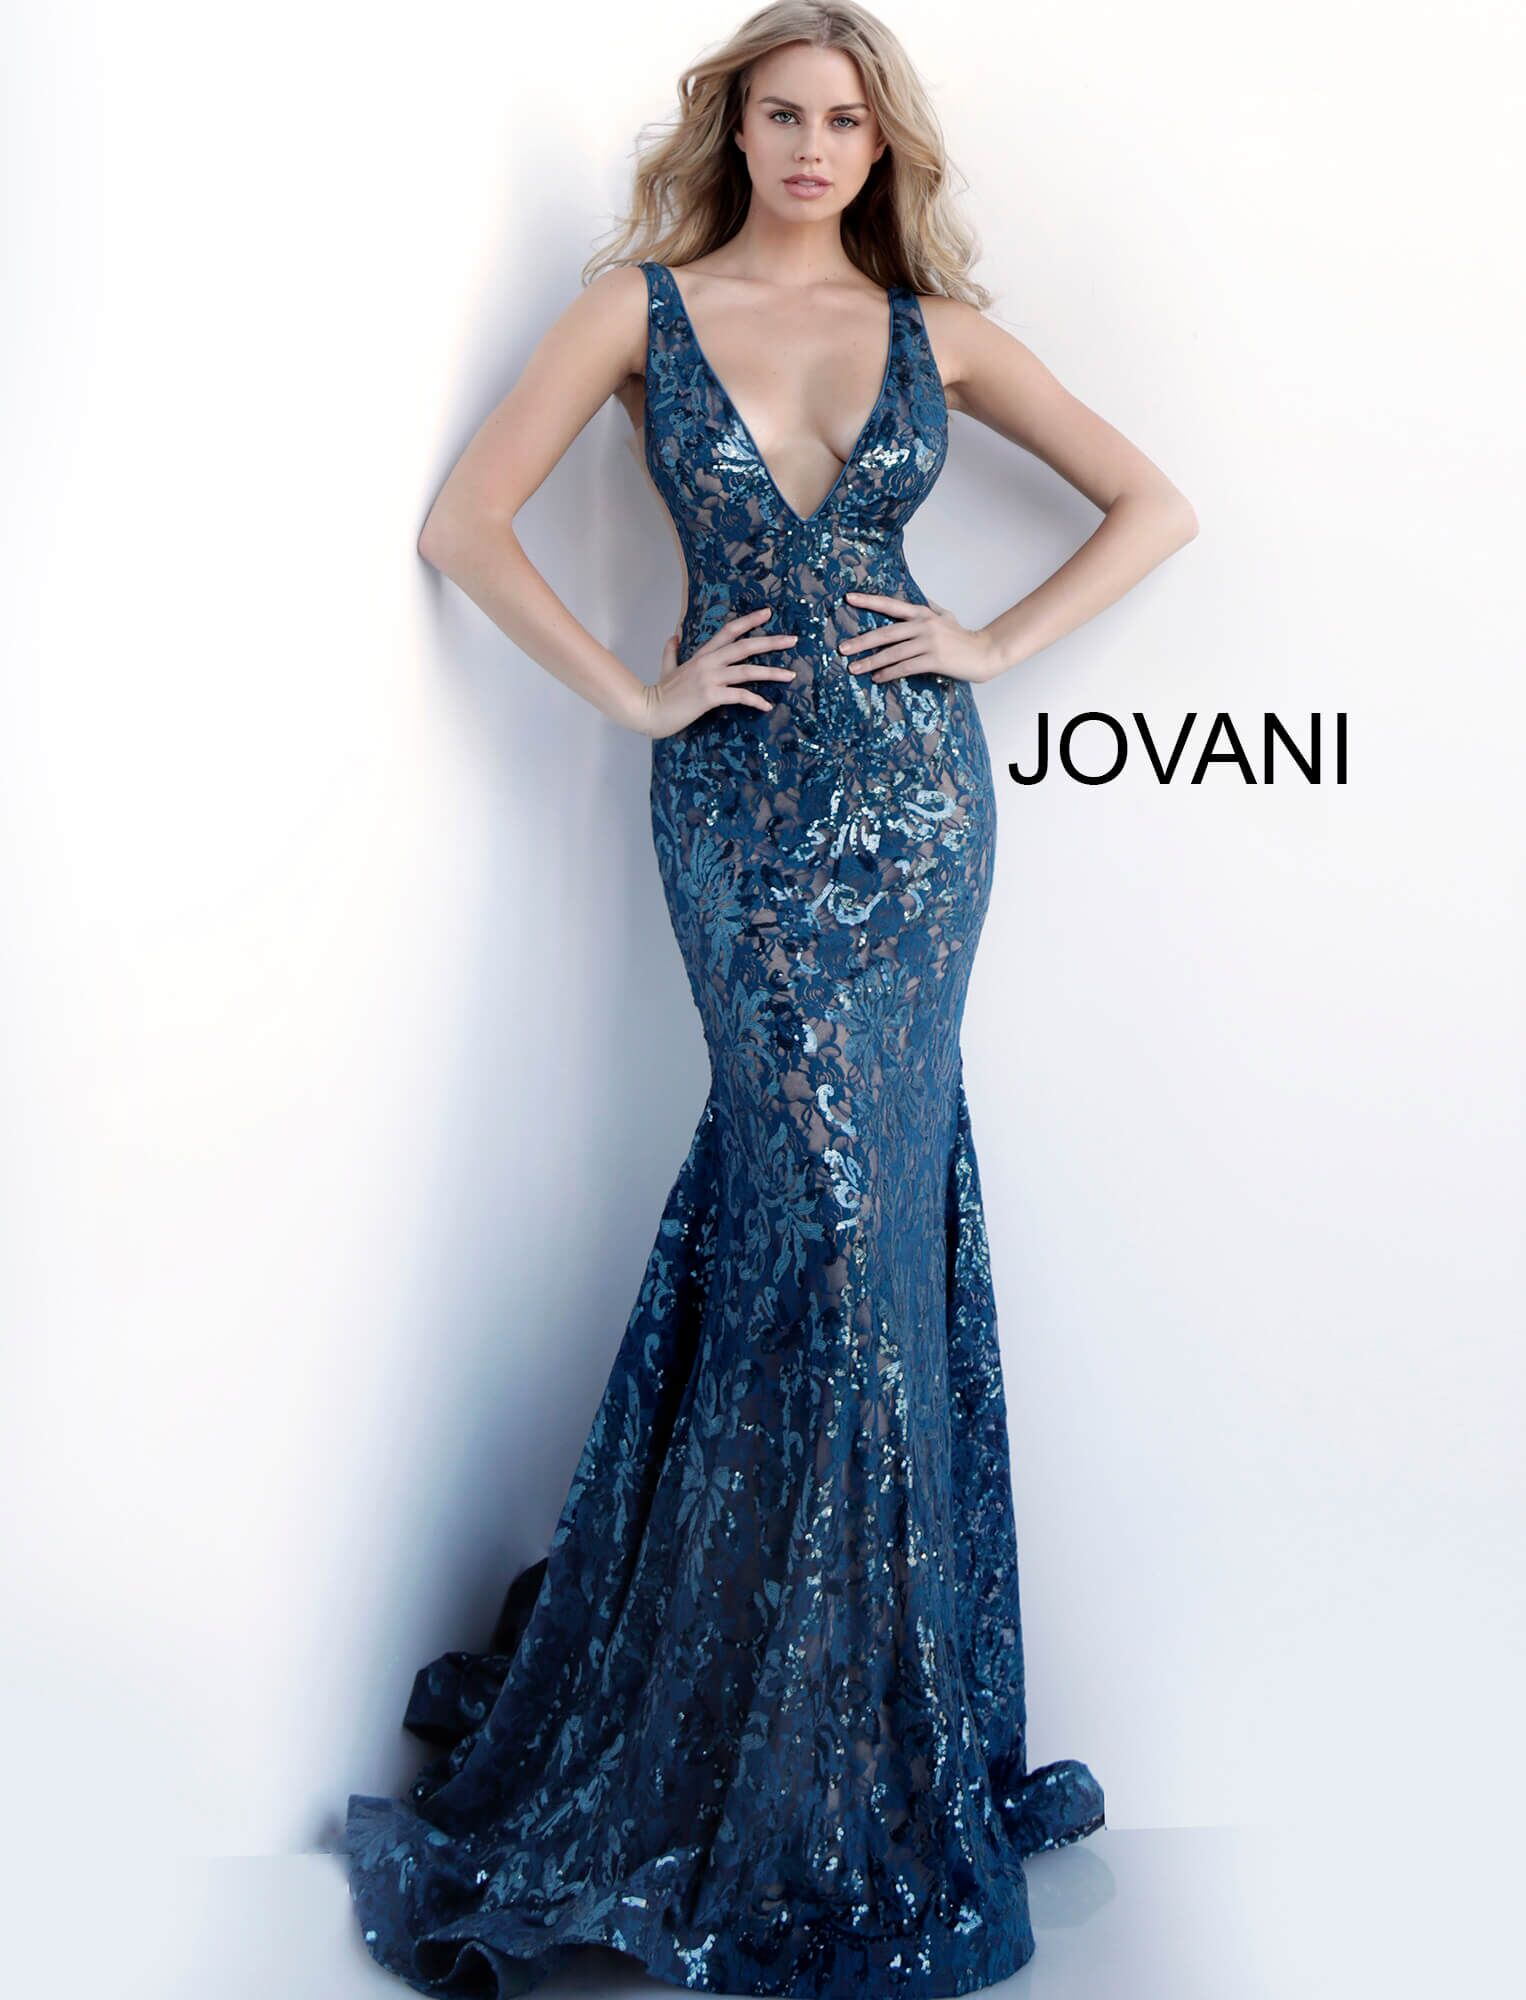 Jovani teal sequinned maxi dress